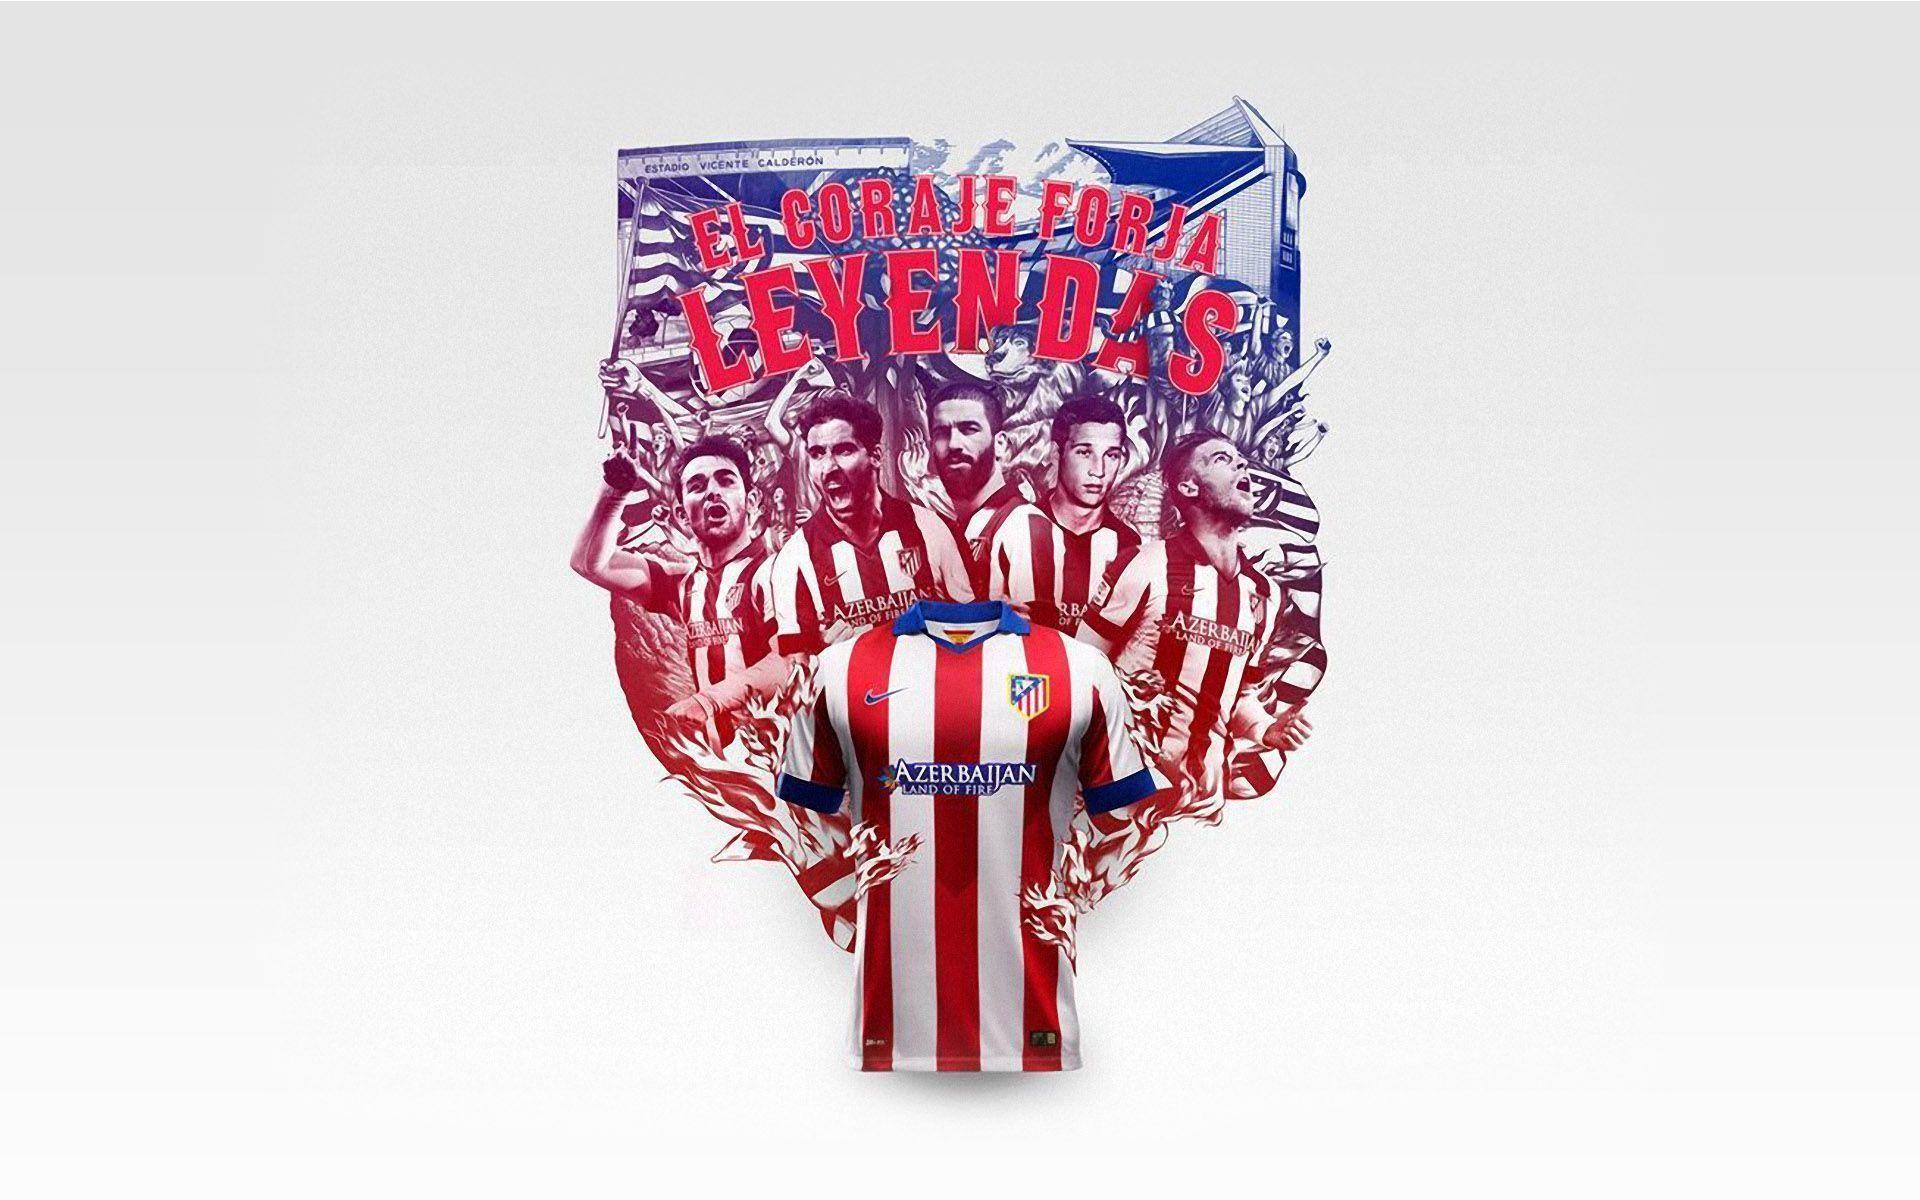 2014 Atletico Madrid Wallpapers For Desktop 2637 Football ...